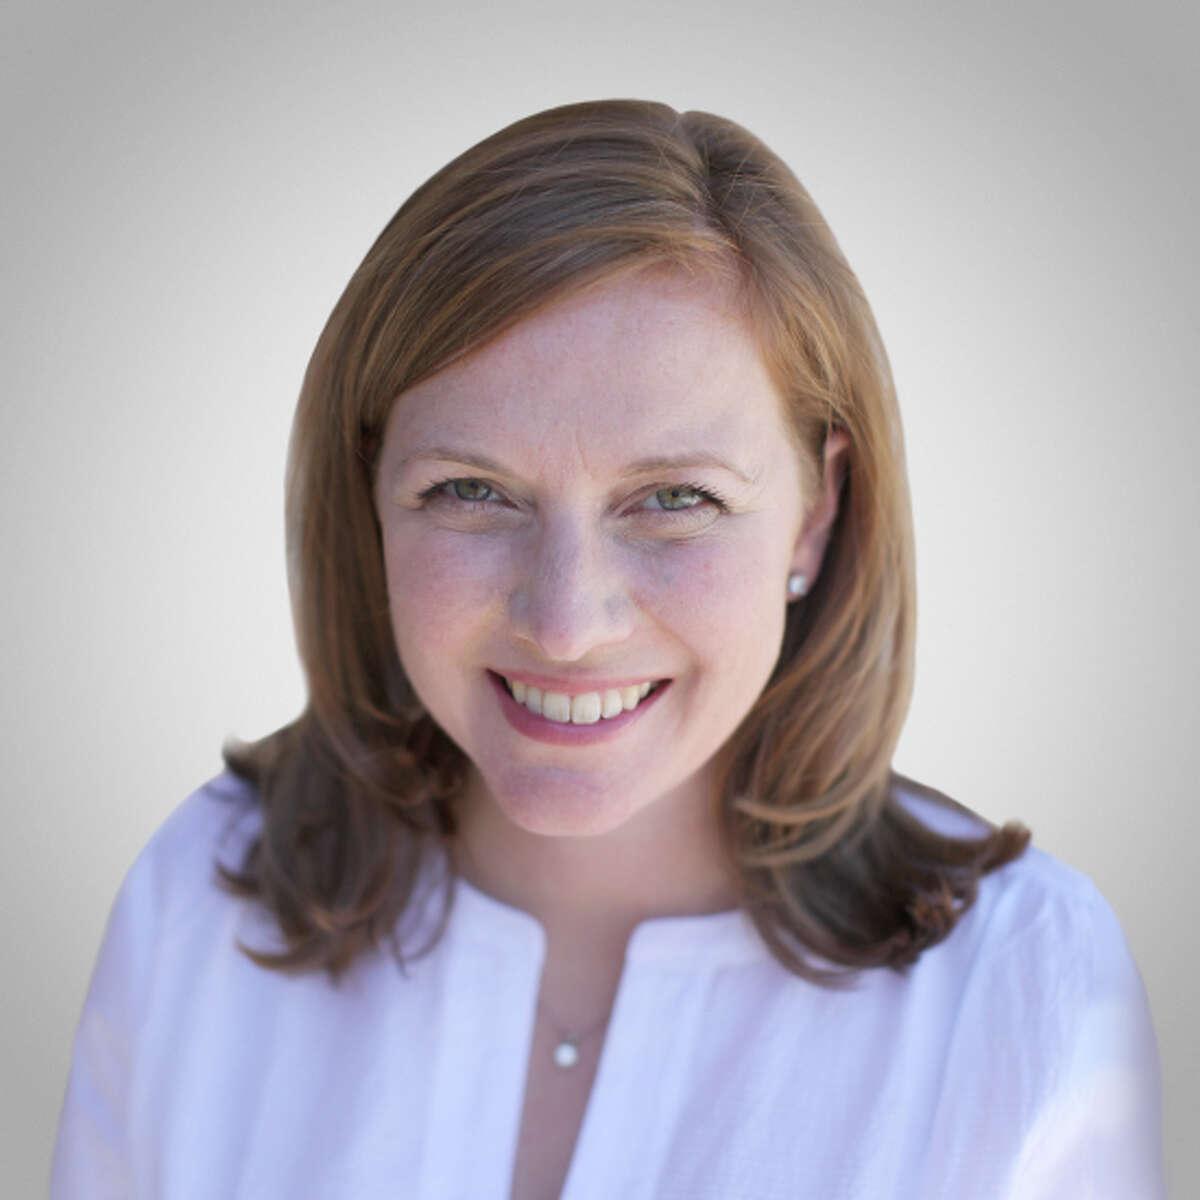 Lizzie Pannill Fletcher, candidate for U. S. Representative District 7.